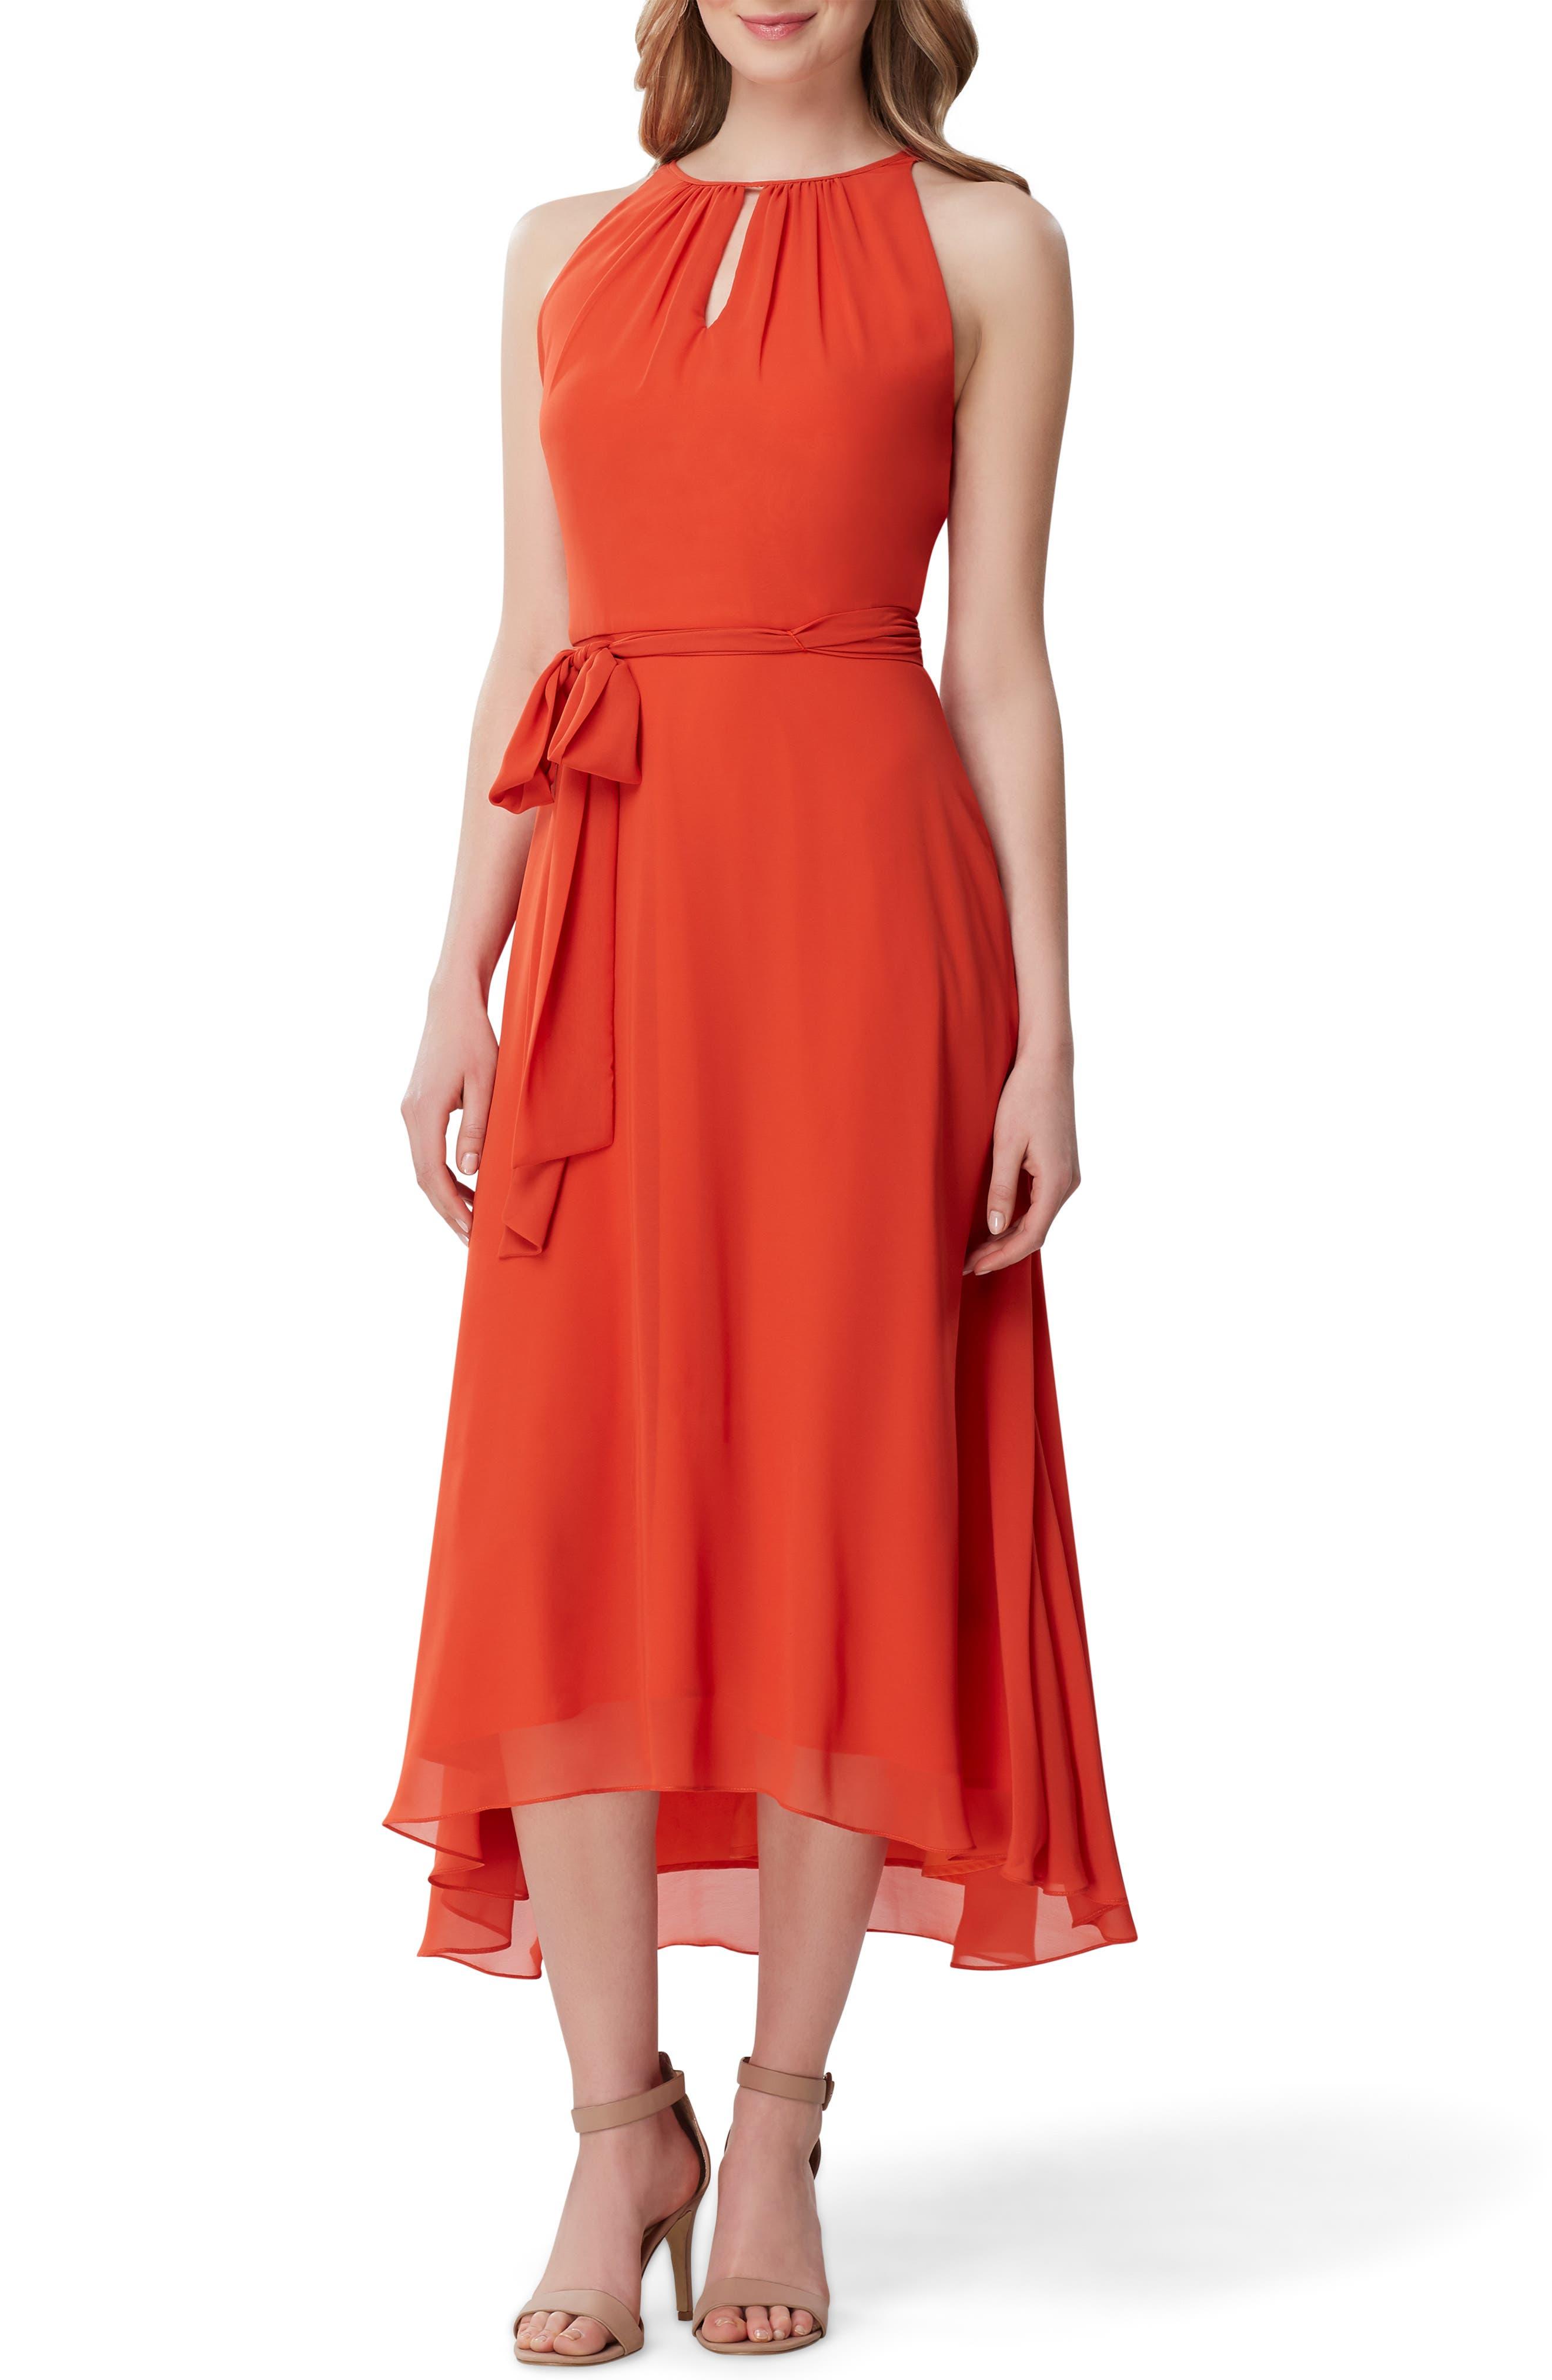 Petite Tahari Sleeveless Tie Waist Chiffon Midi Dress, Orange